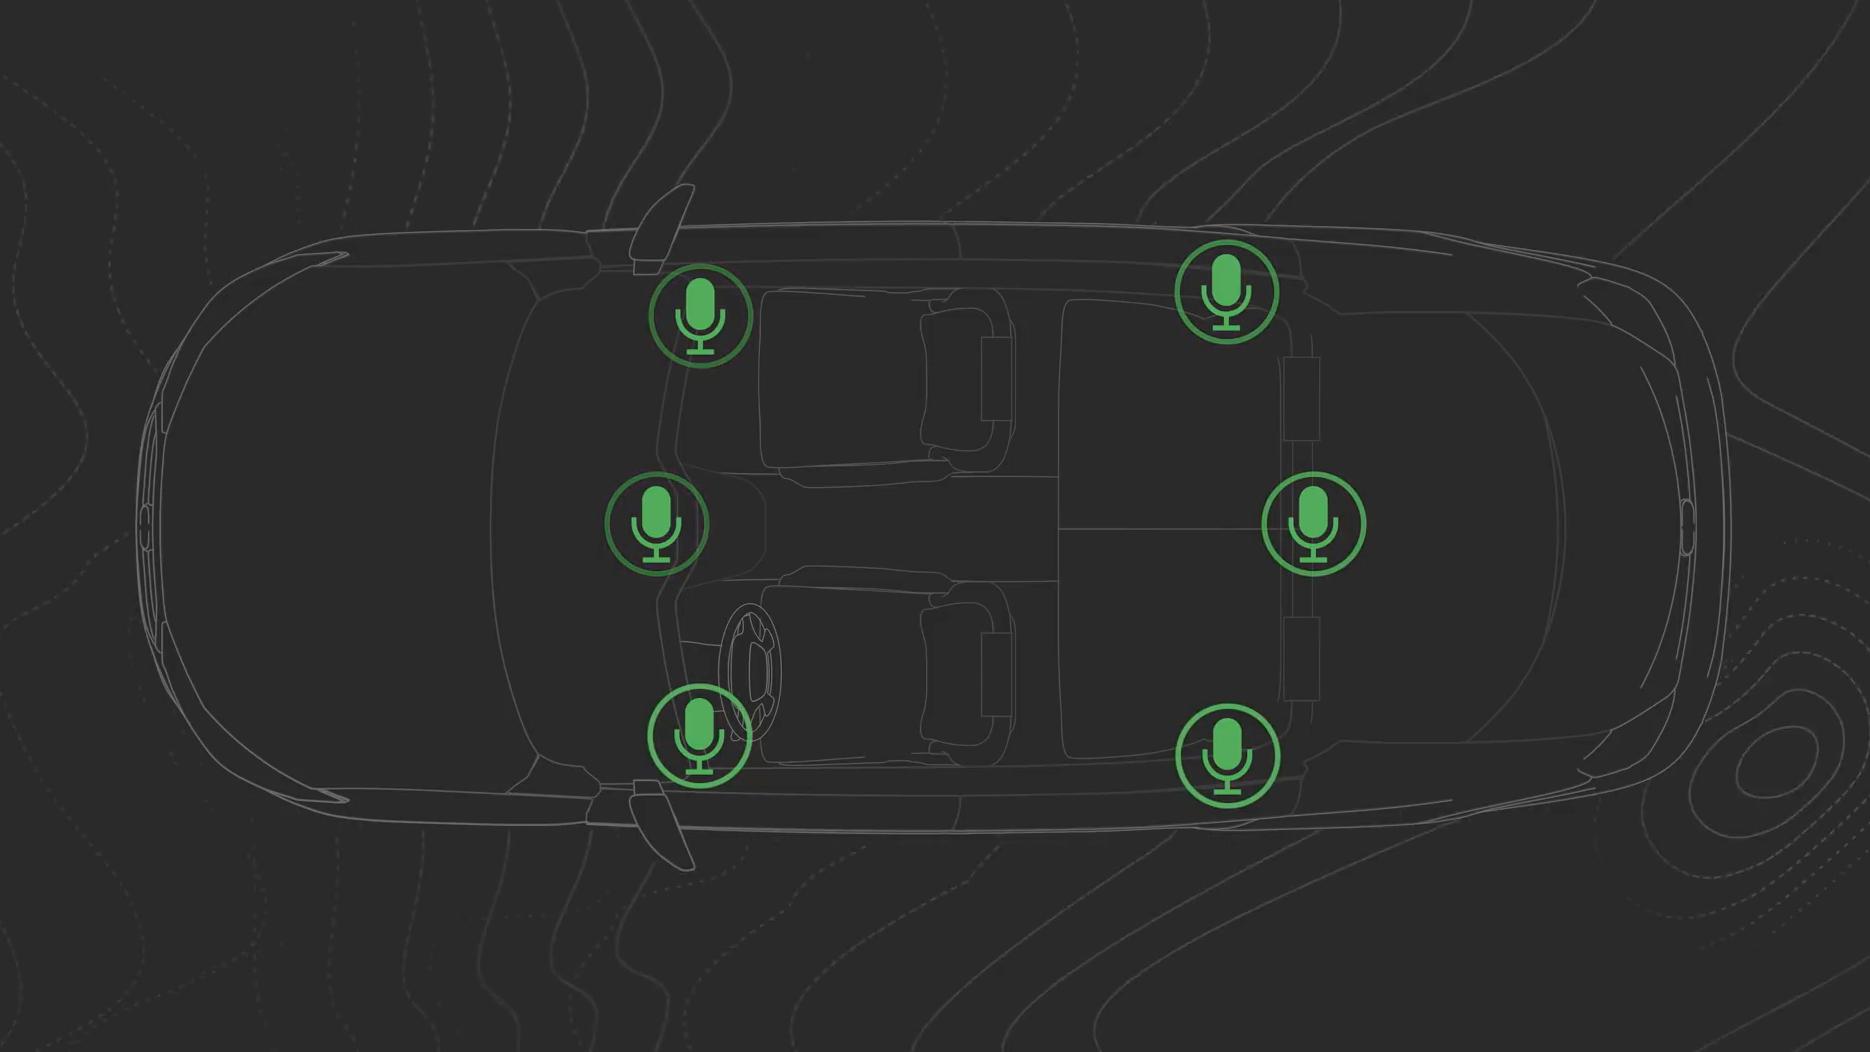 Bose QuietComfort Road Noise Control CES 2019 16x9